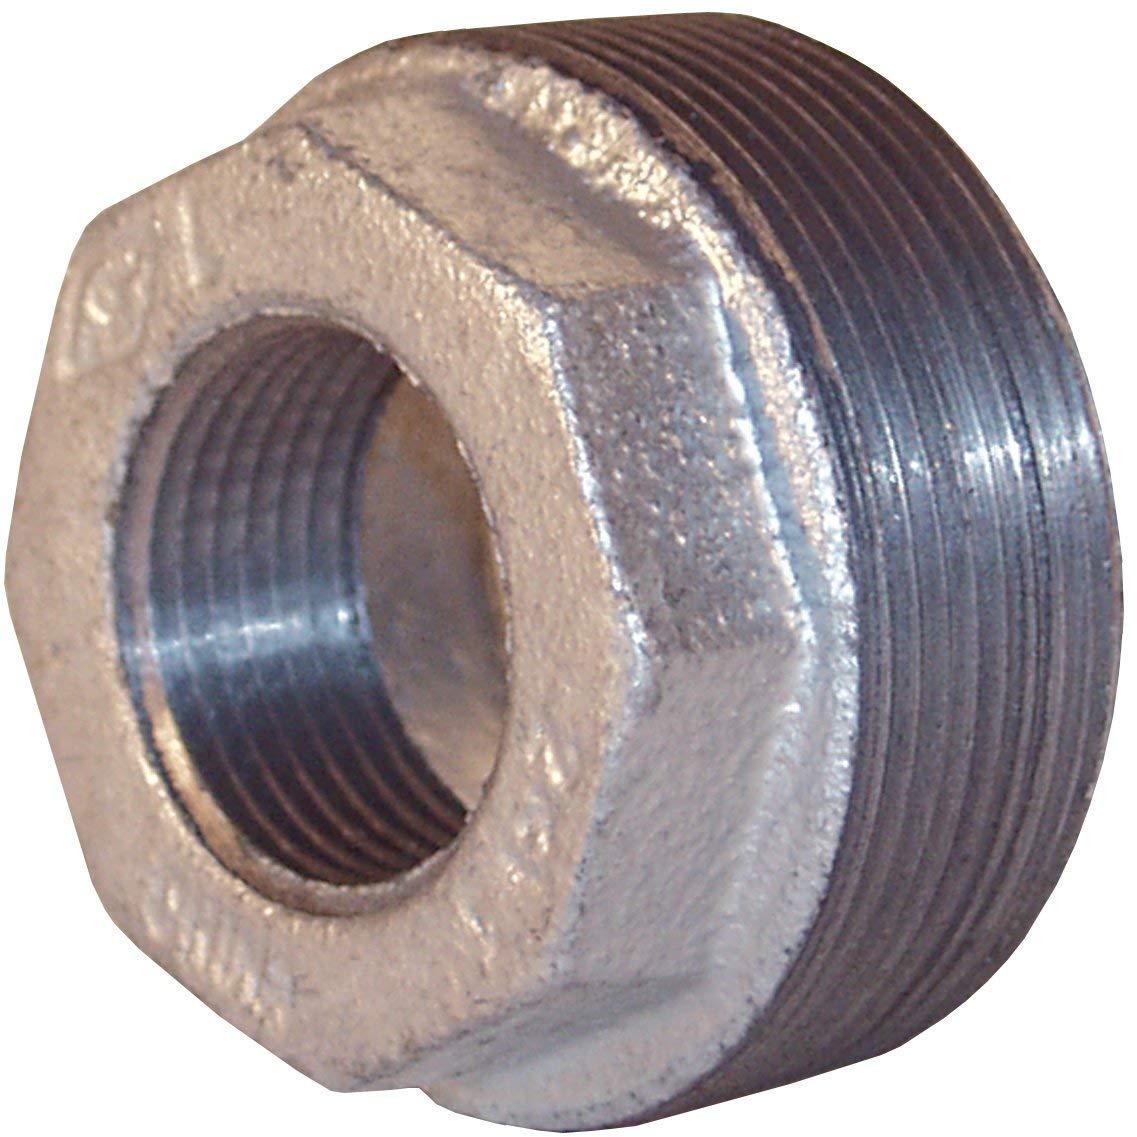 Dixon HB2075G 150# Galv Iron Reducer Hex Bushing 2 MNPT x 3//4 FNPT